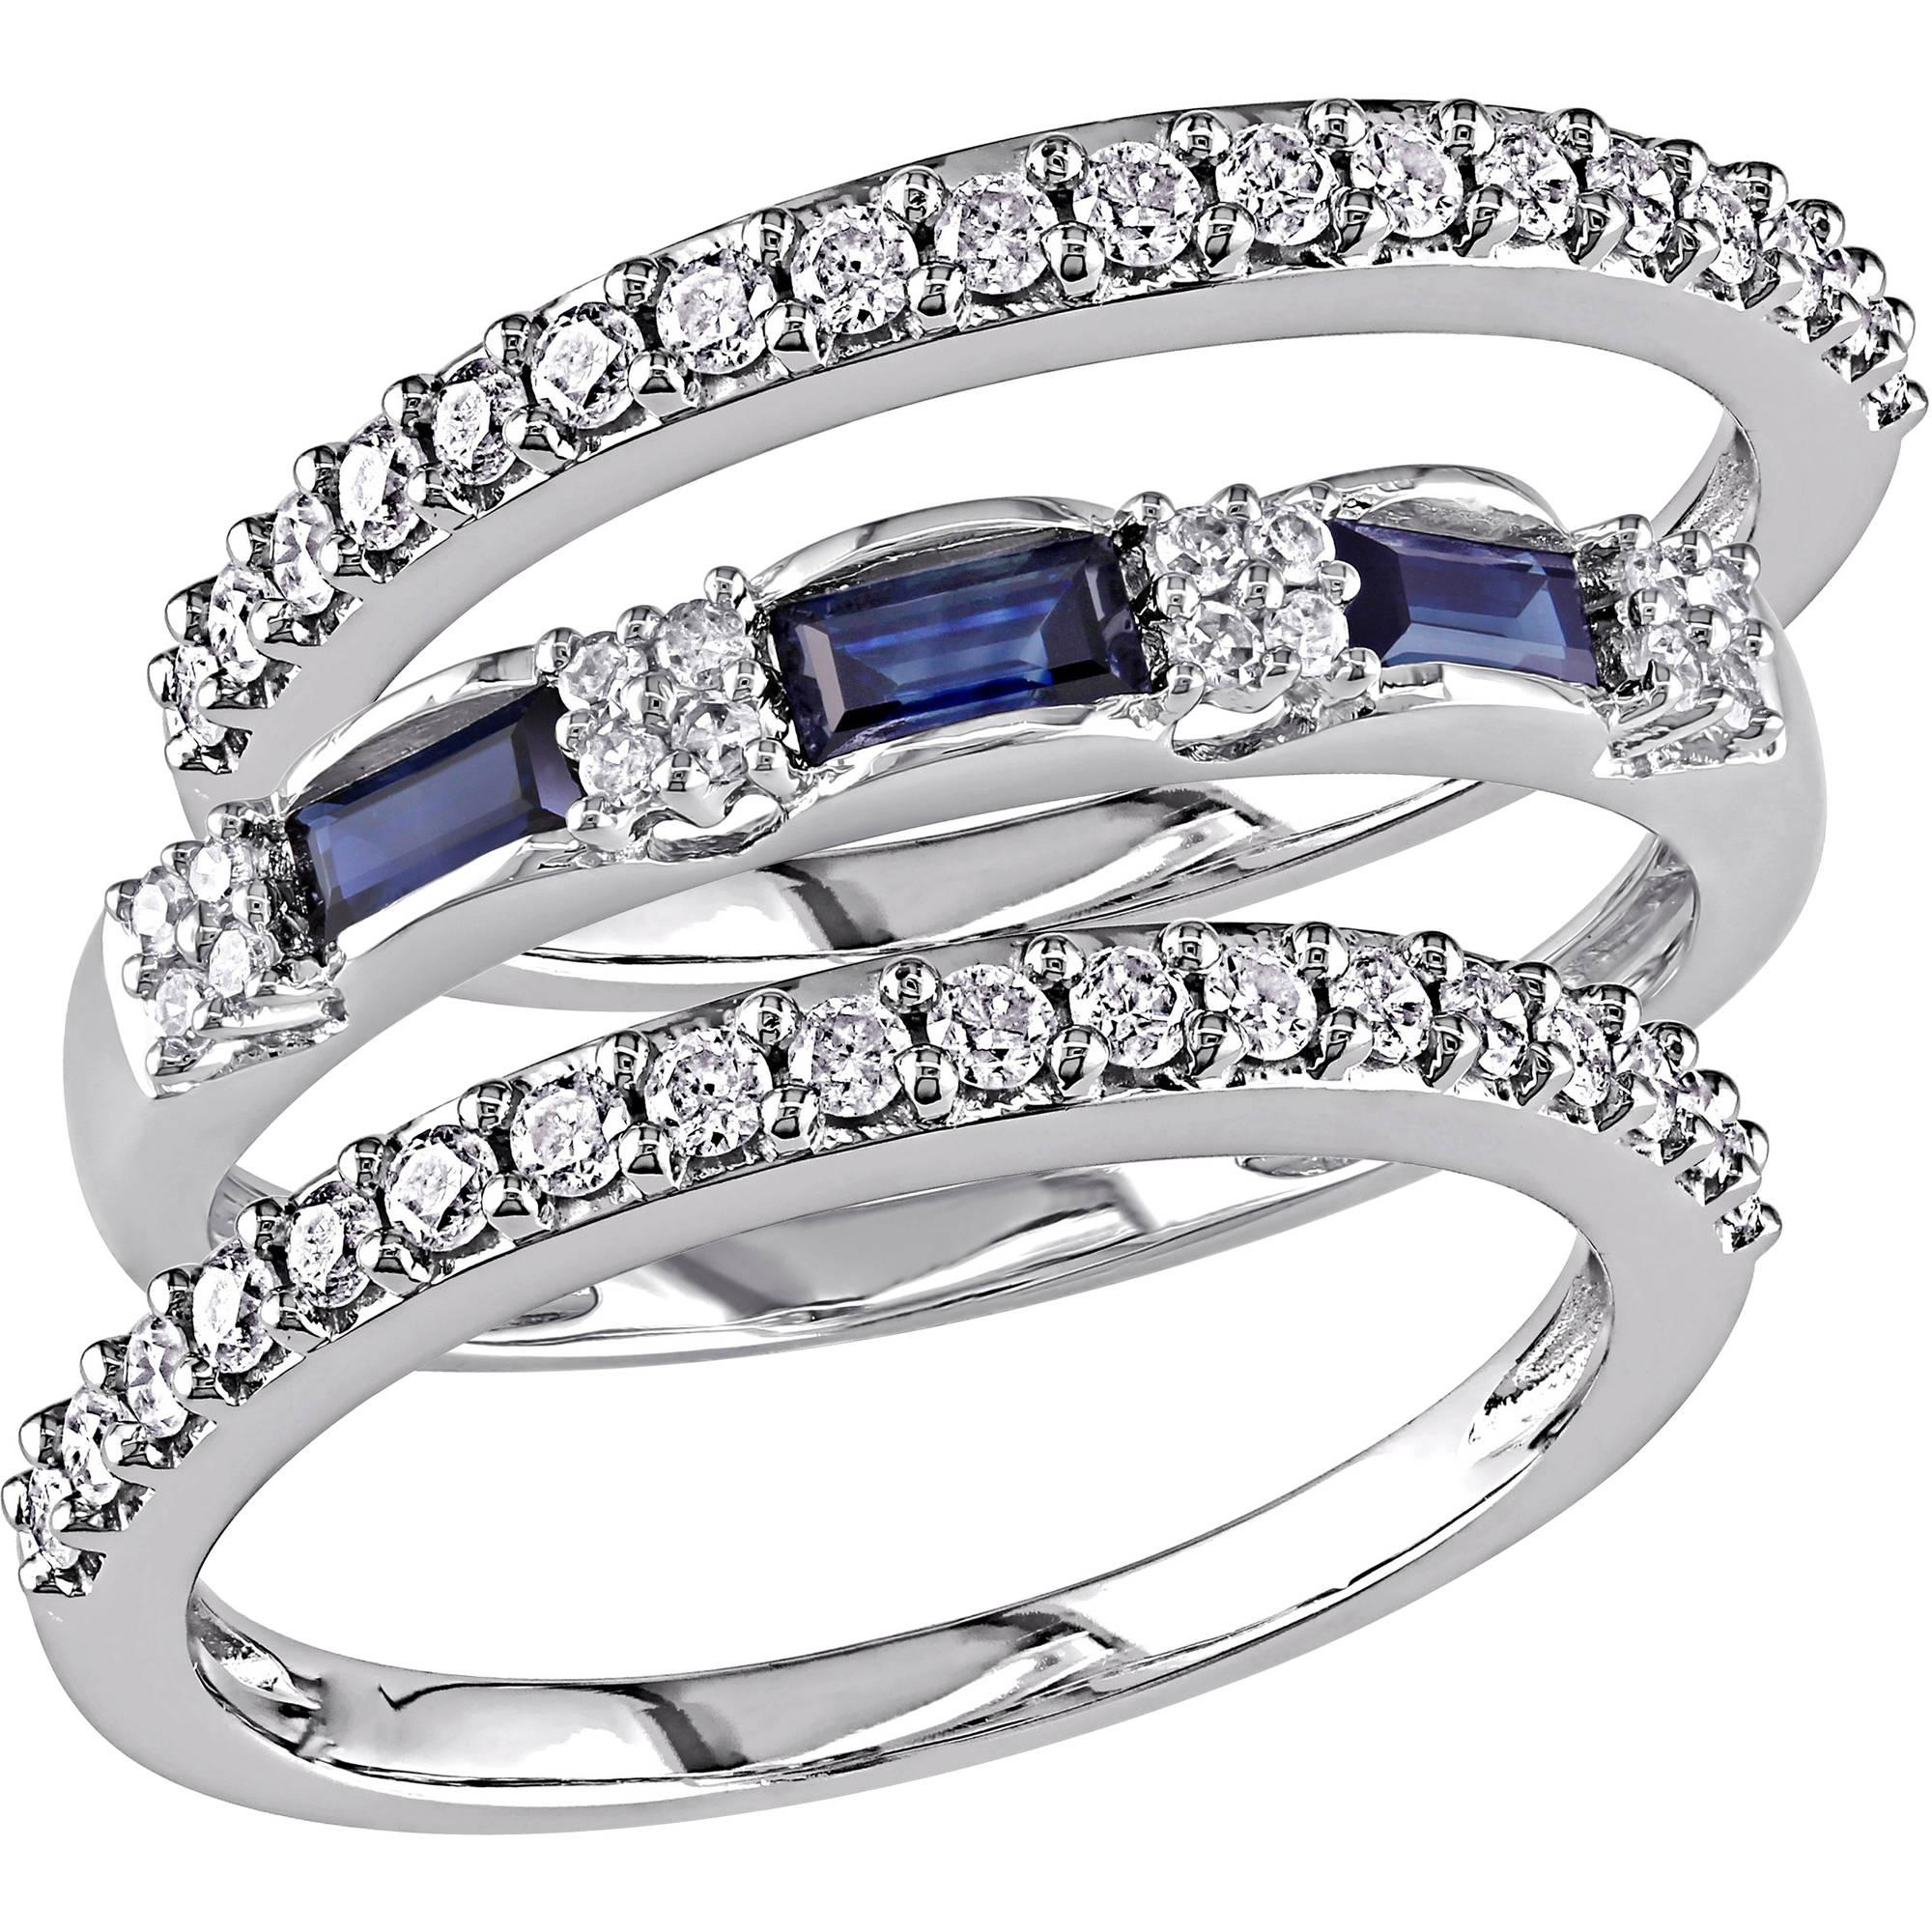 Tangelo 1/2 Carat T.G.W. Blue Sapphire and 1/2 Carat T.W. Diamond 10kt White Gold 3-Piece Ring Set